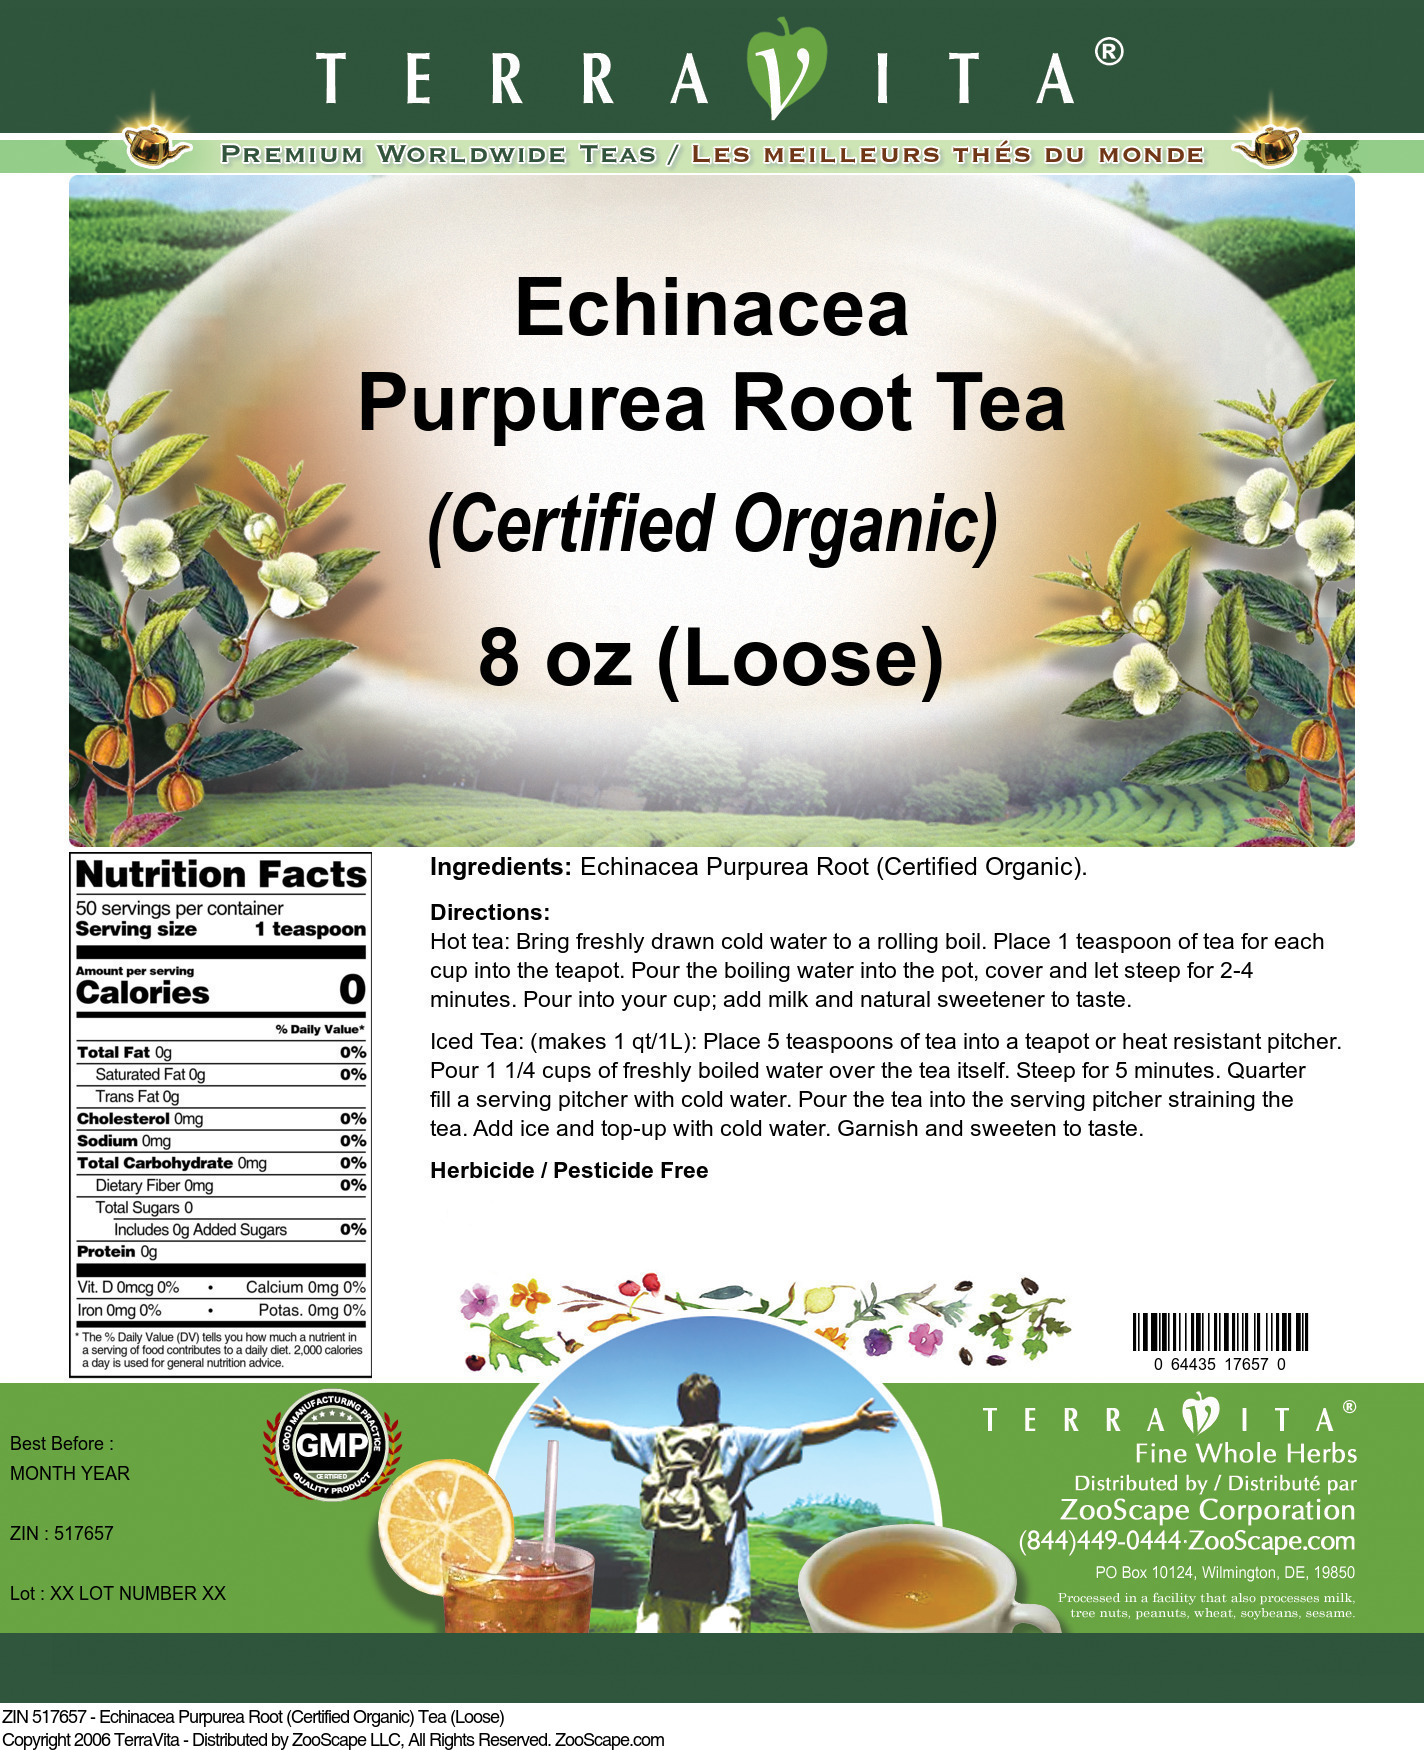 Echinacea Purpurea Root (Certified Organic) Tea (Loose)